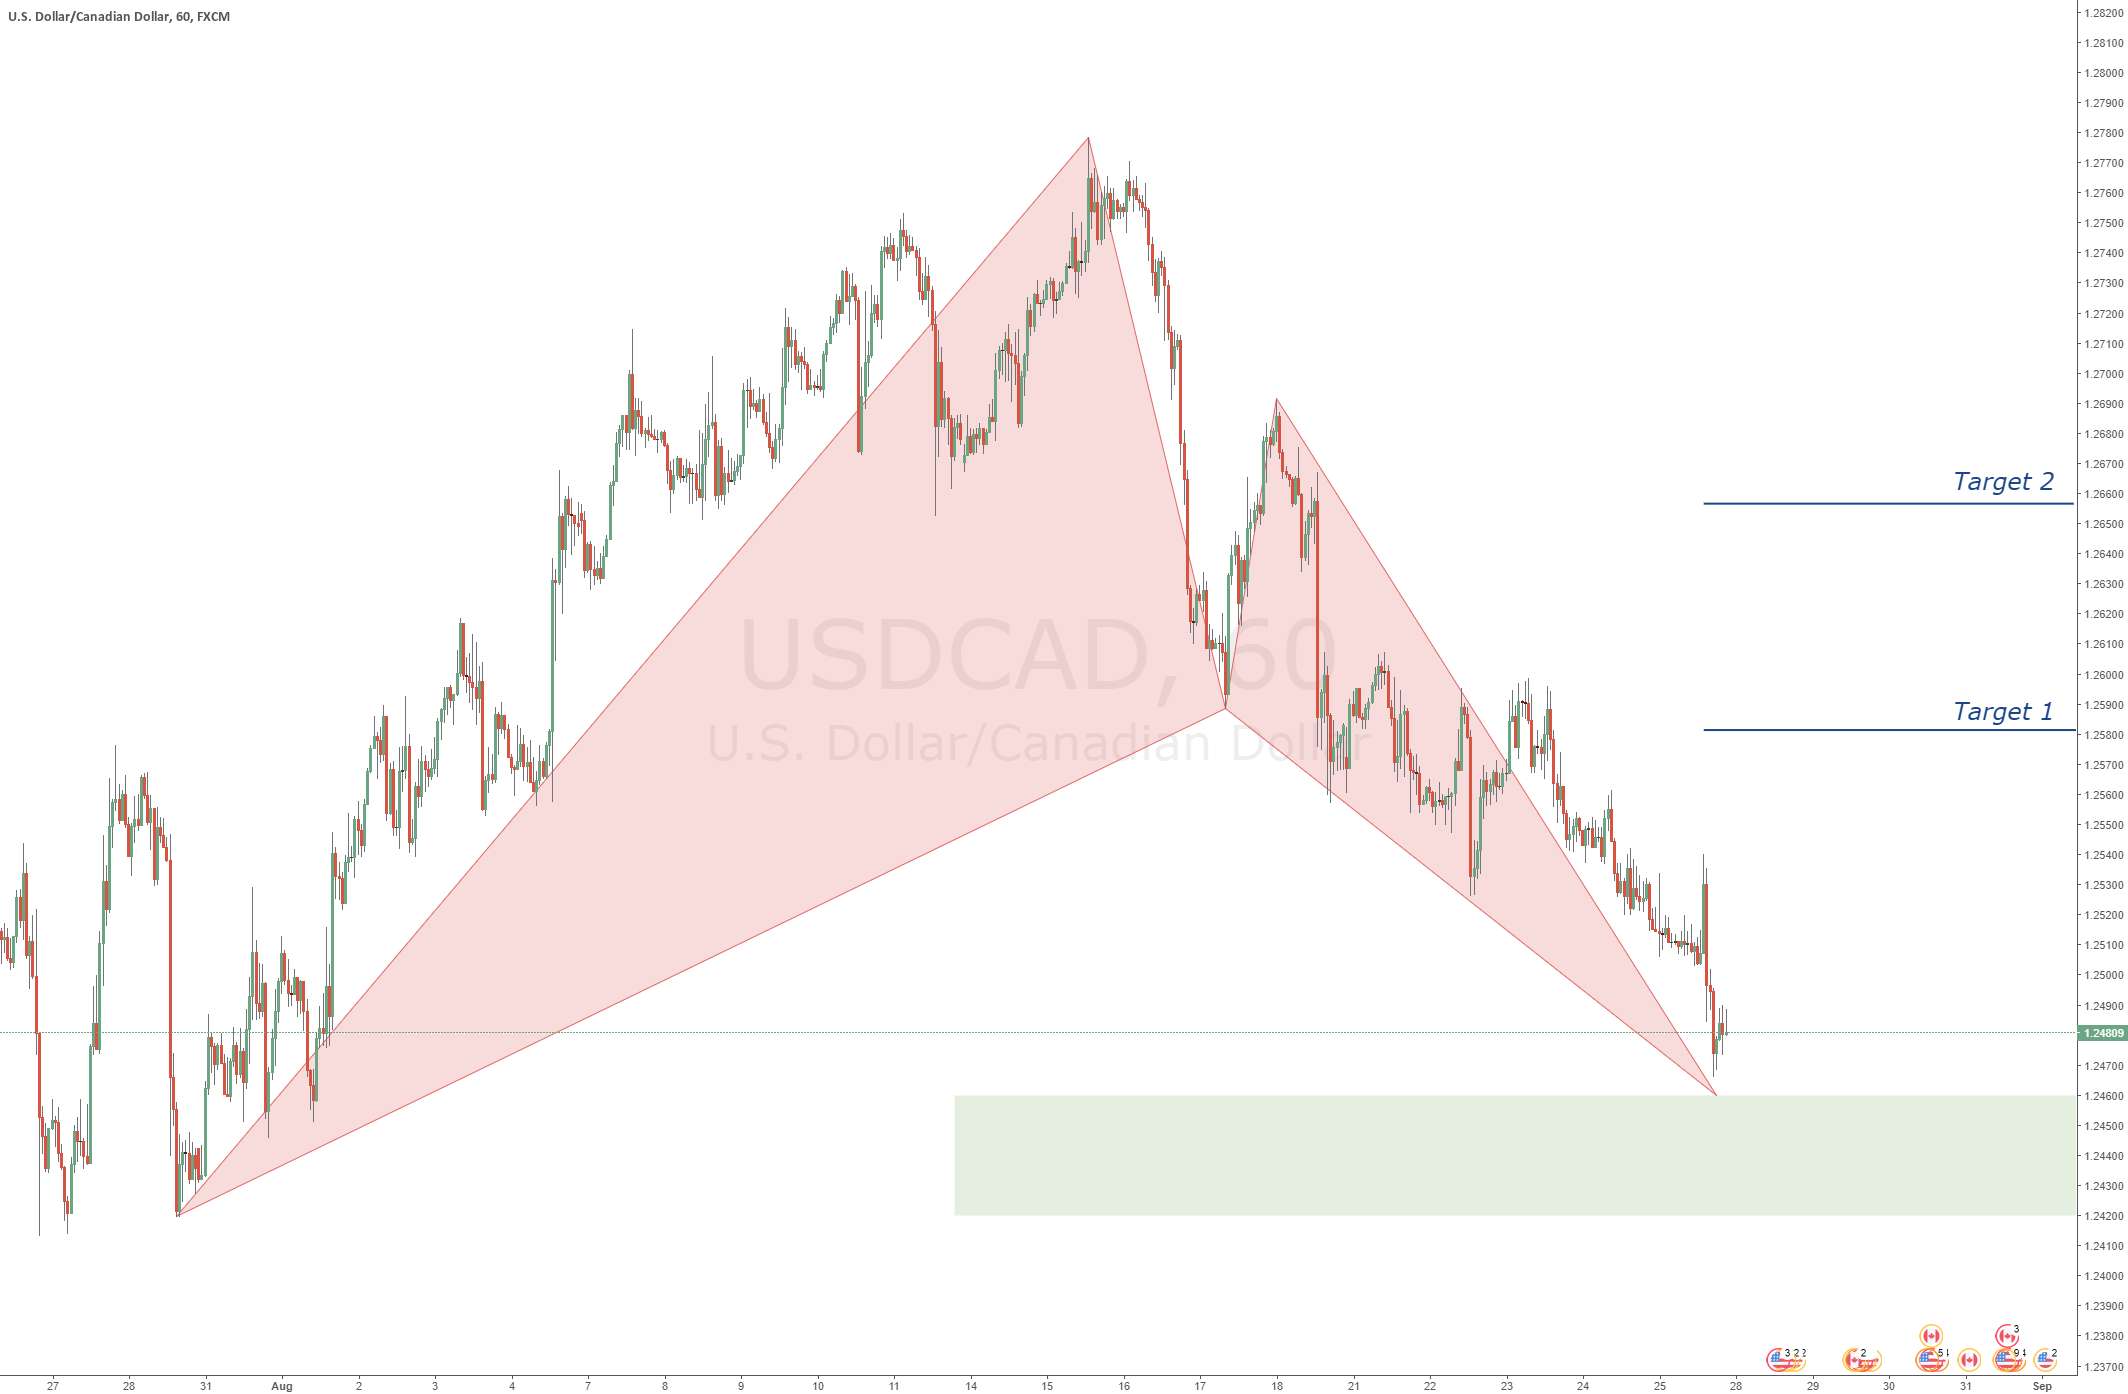 USDCAD - Bullish Bat Pattern